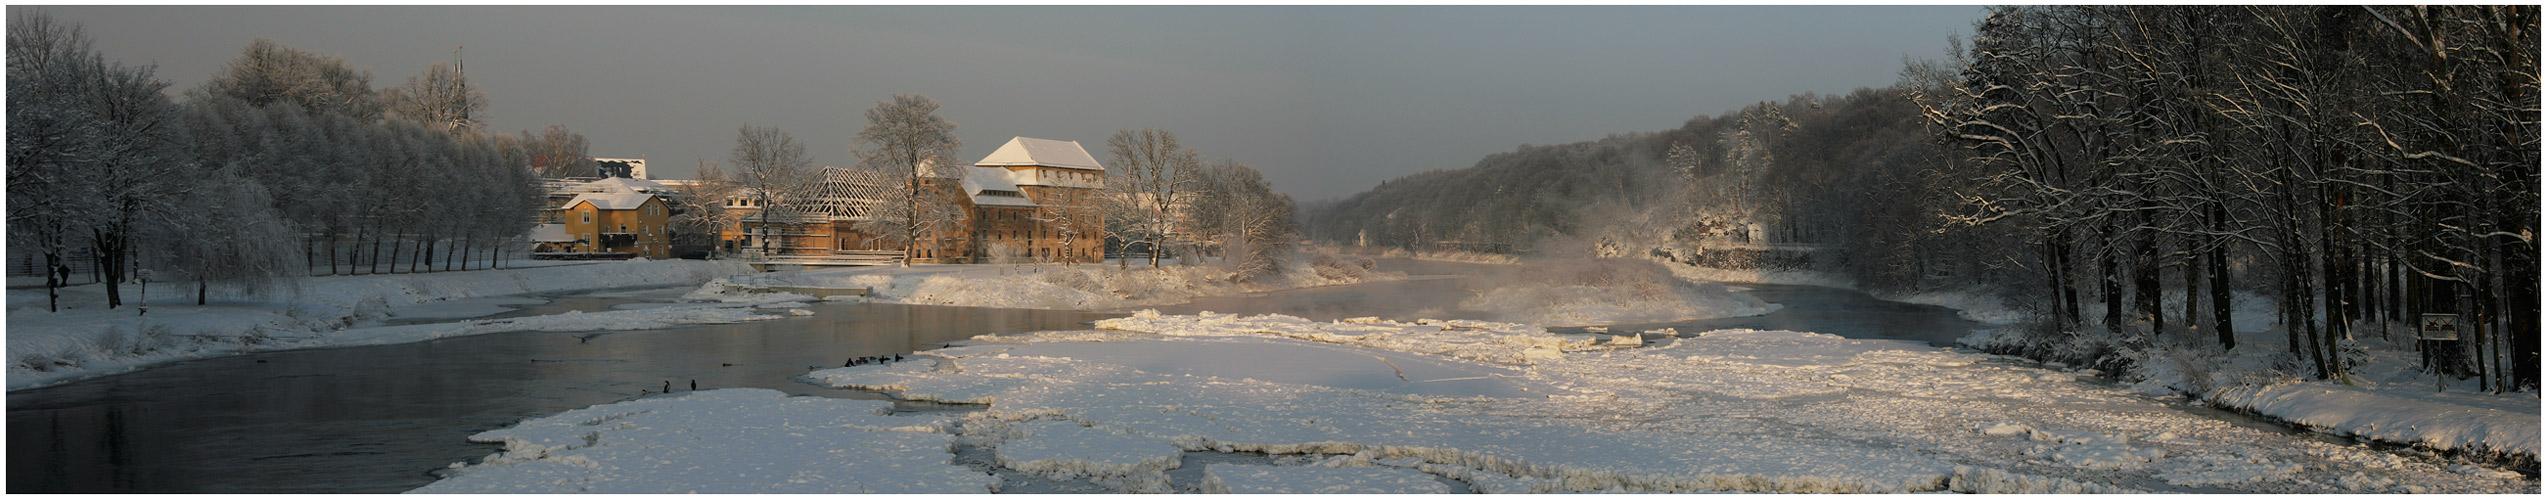 Mühlenpanorama